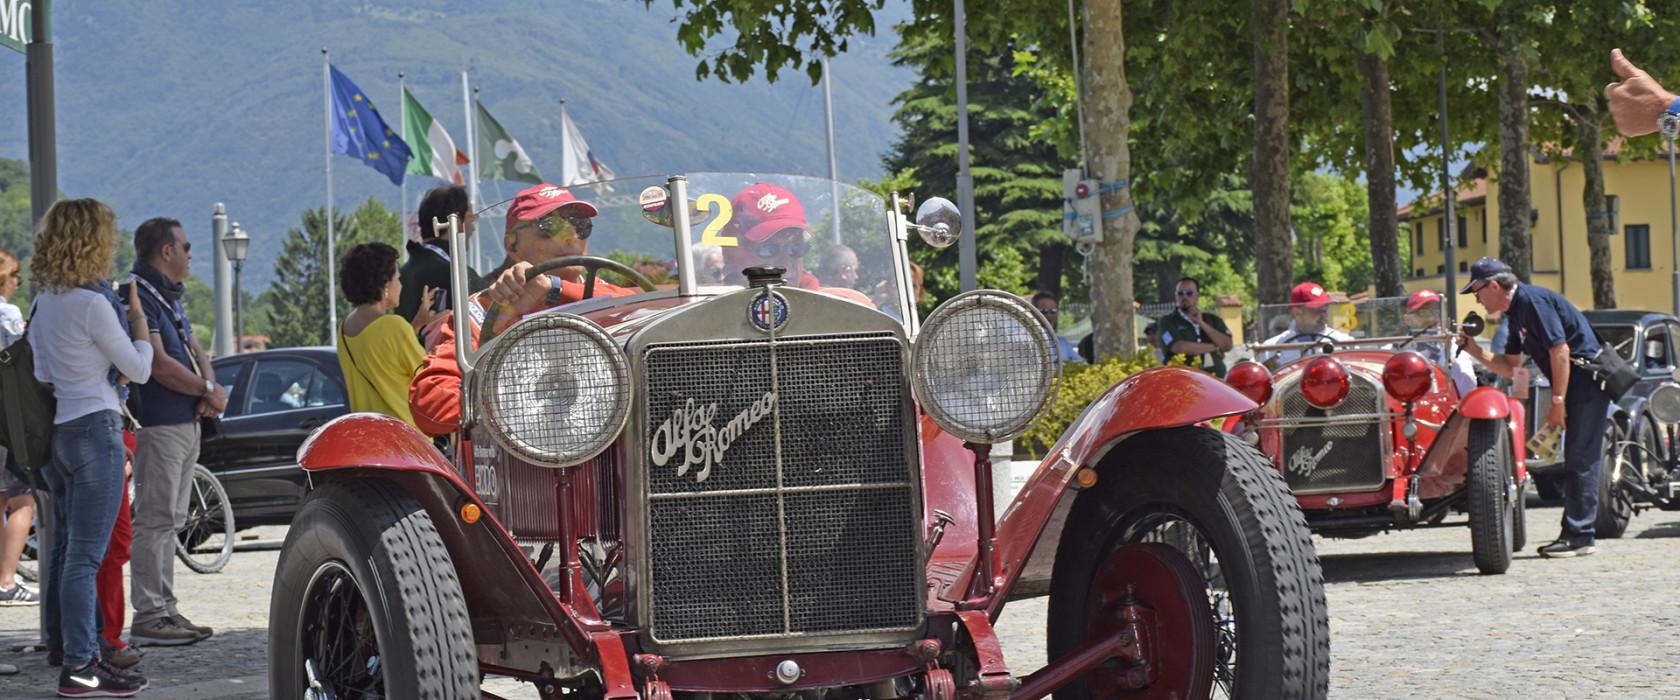 GP Nuvolari RED Weekend